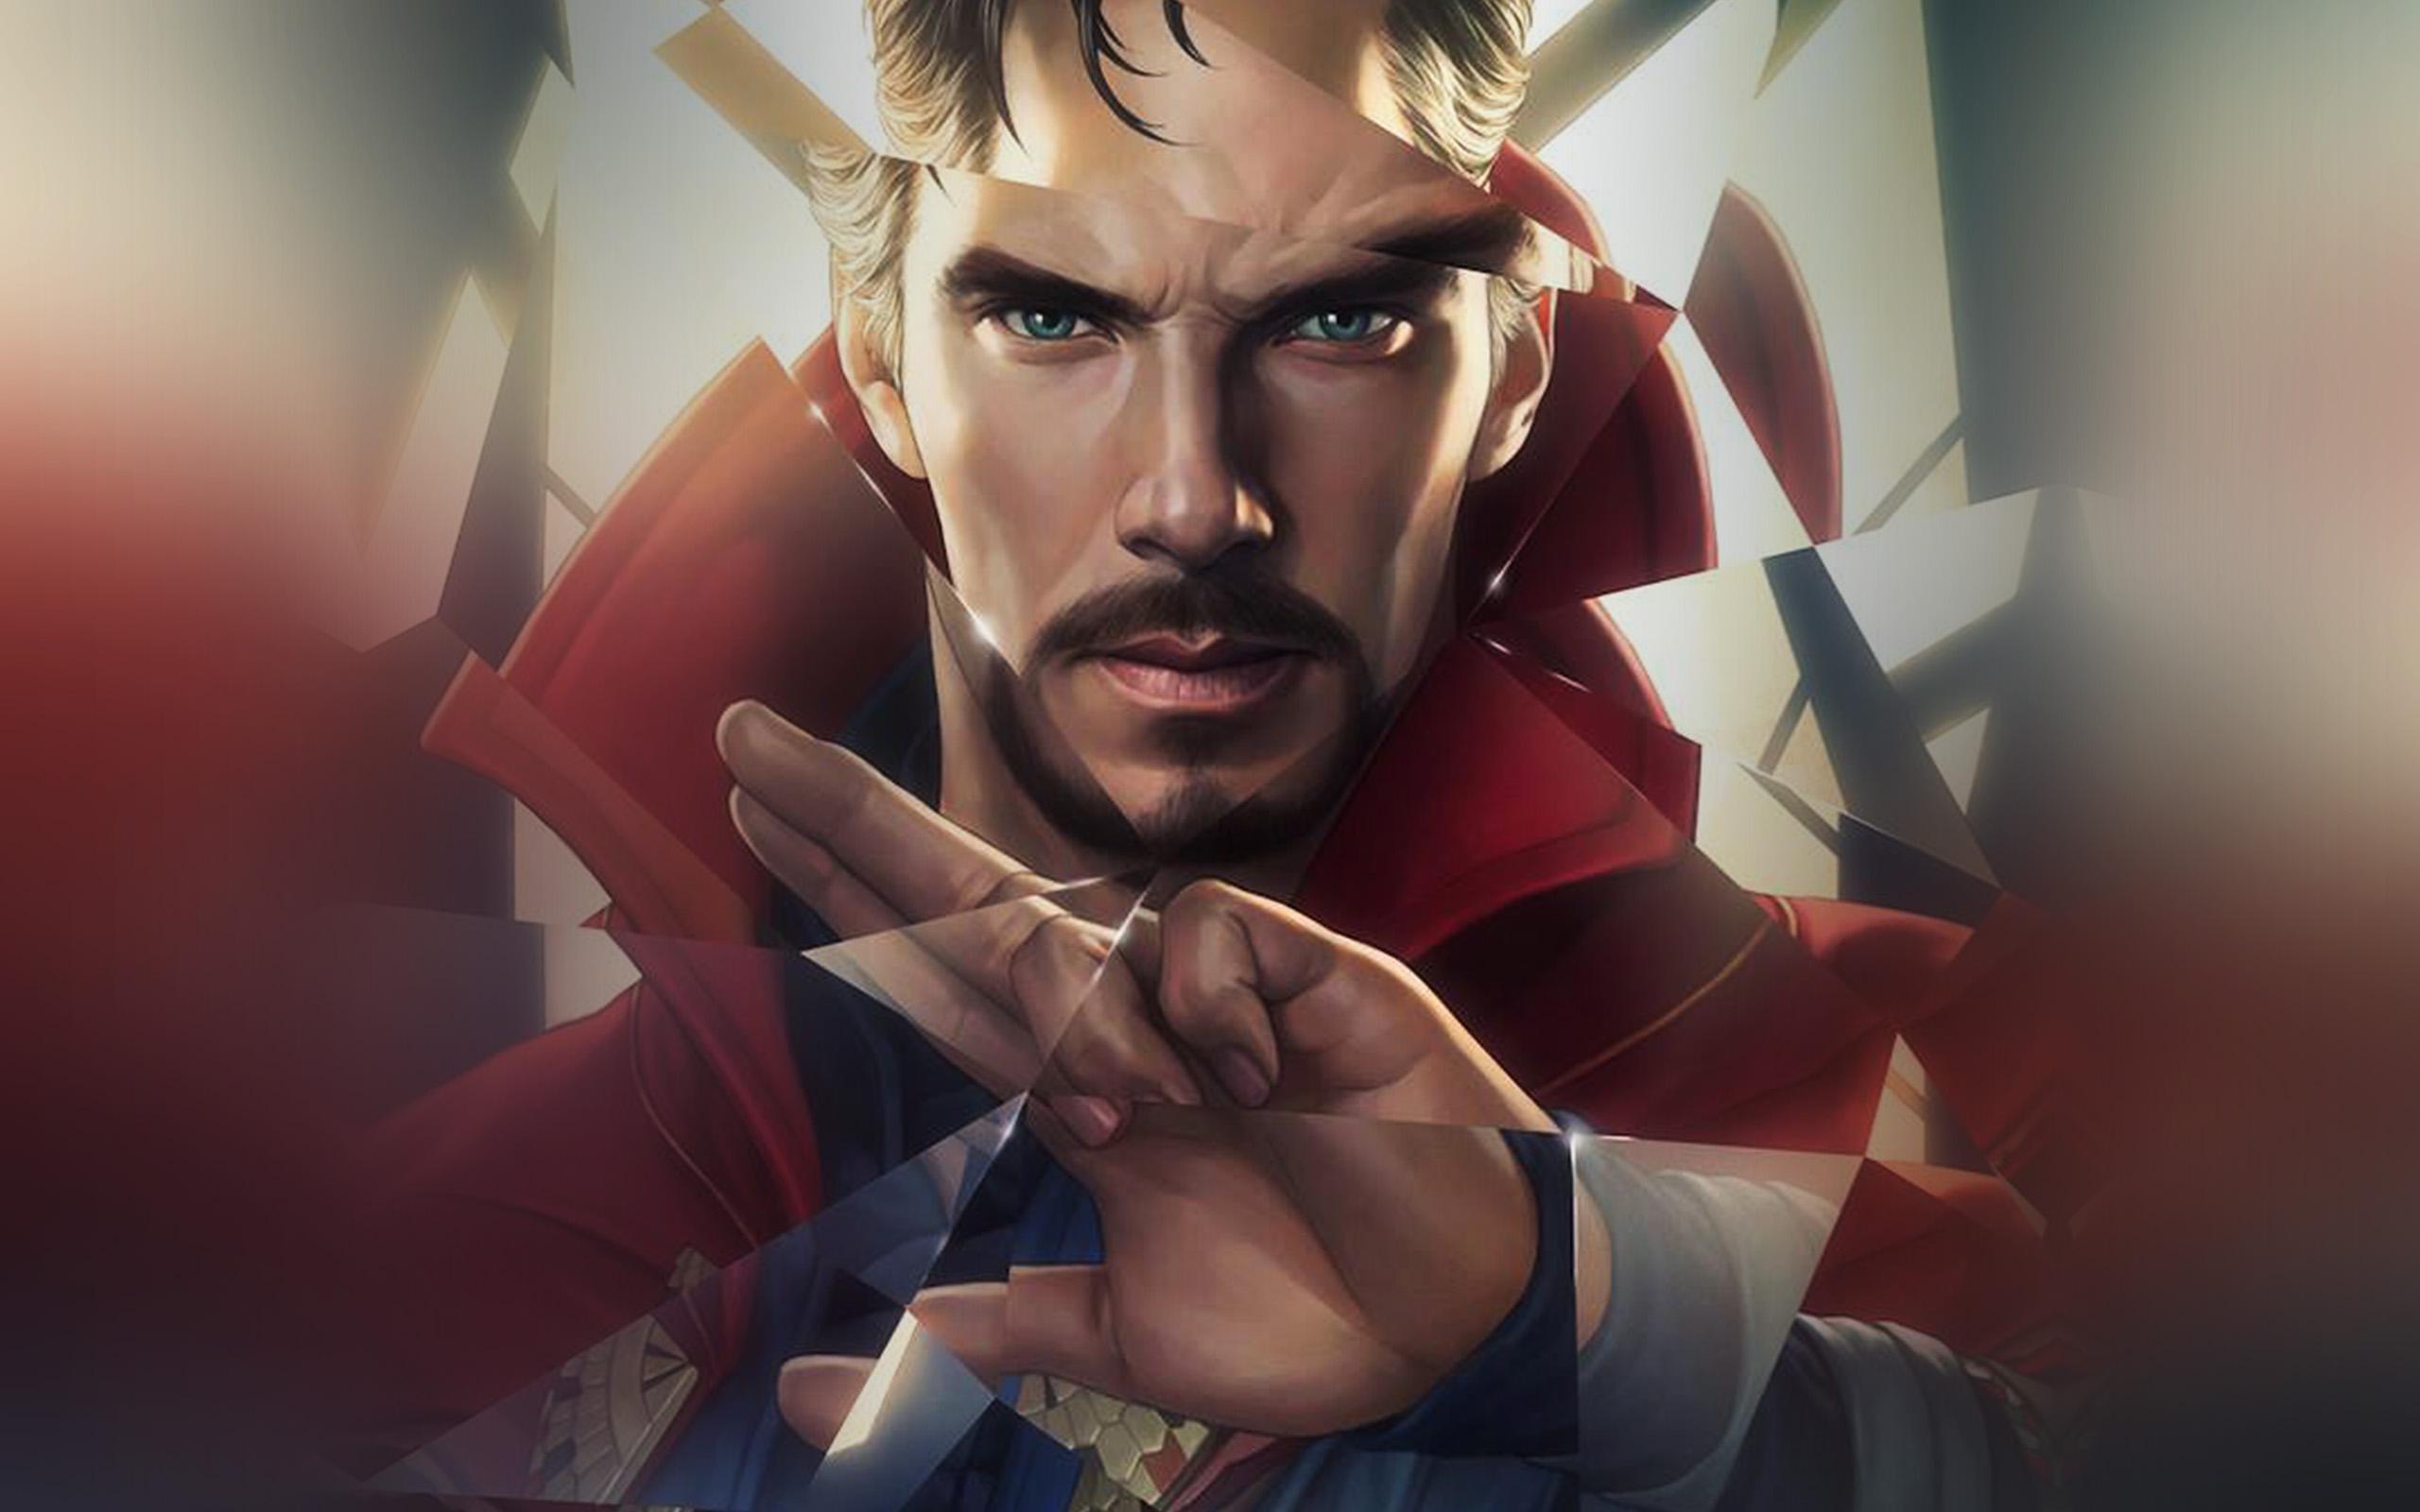 Au77 Doctor Strange Hero Illustration Art: Au77-doctor-strange-hero-illustration-art